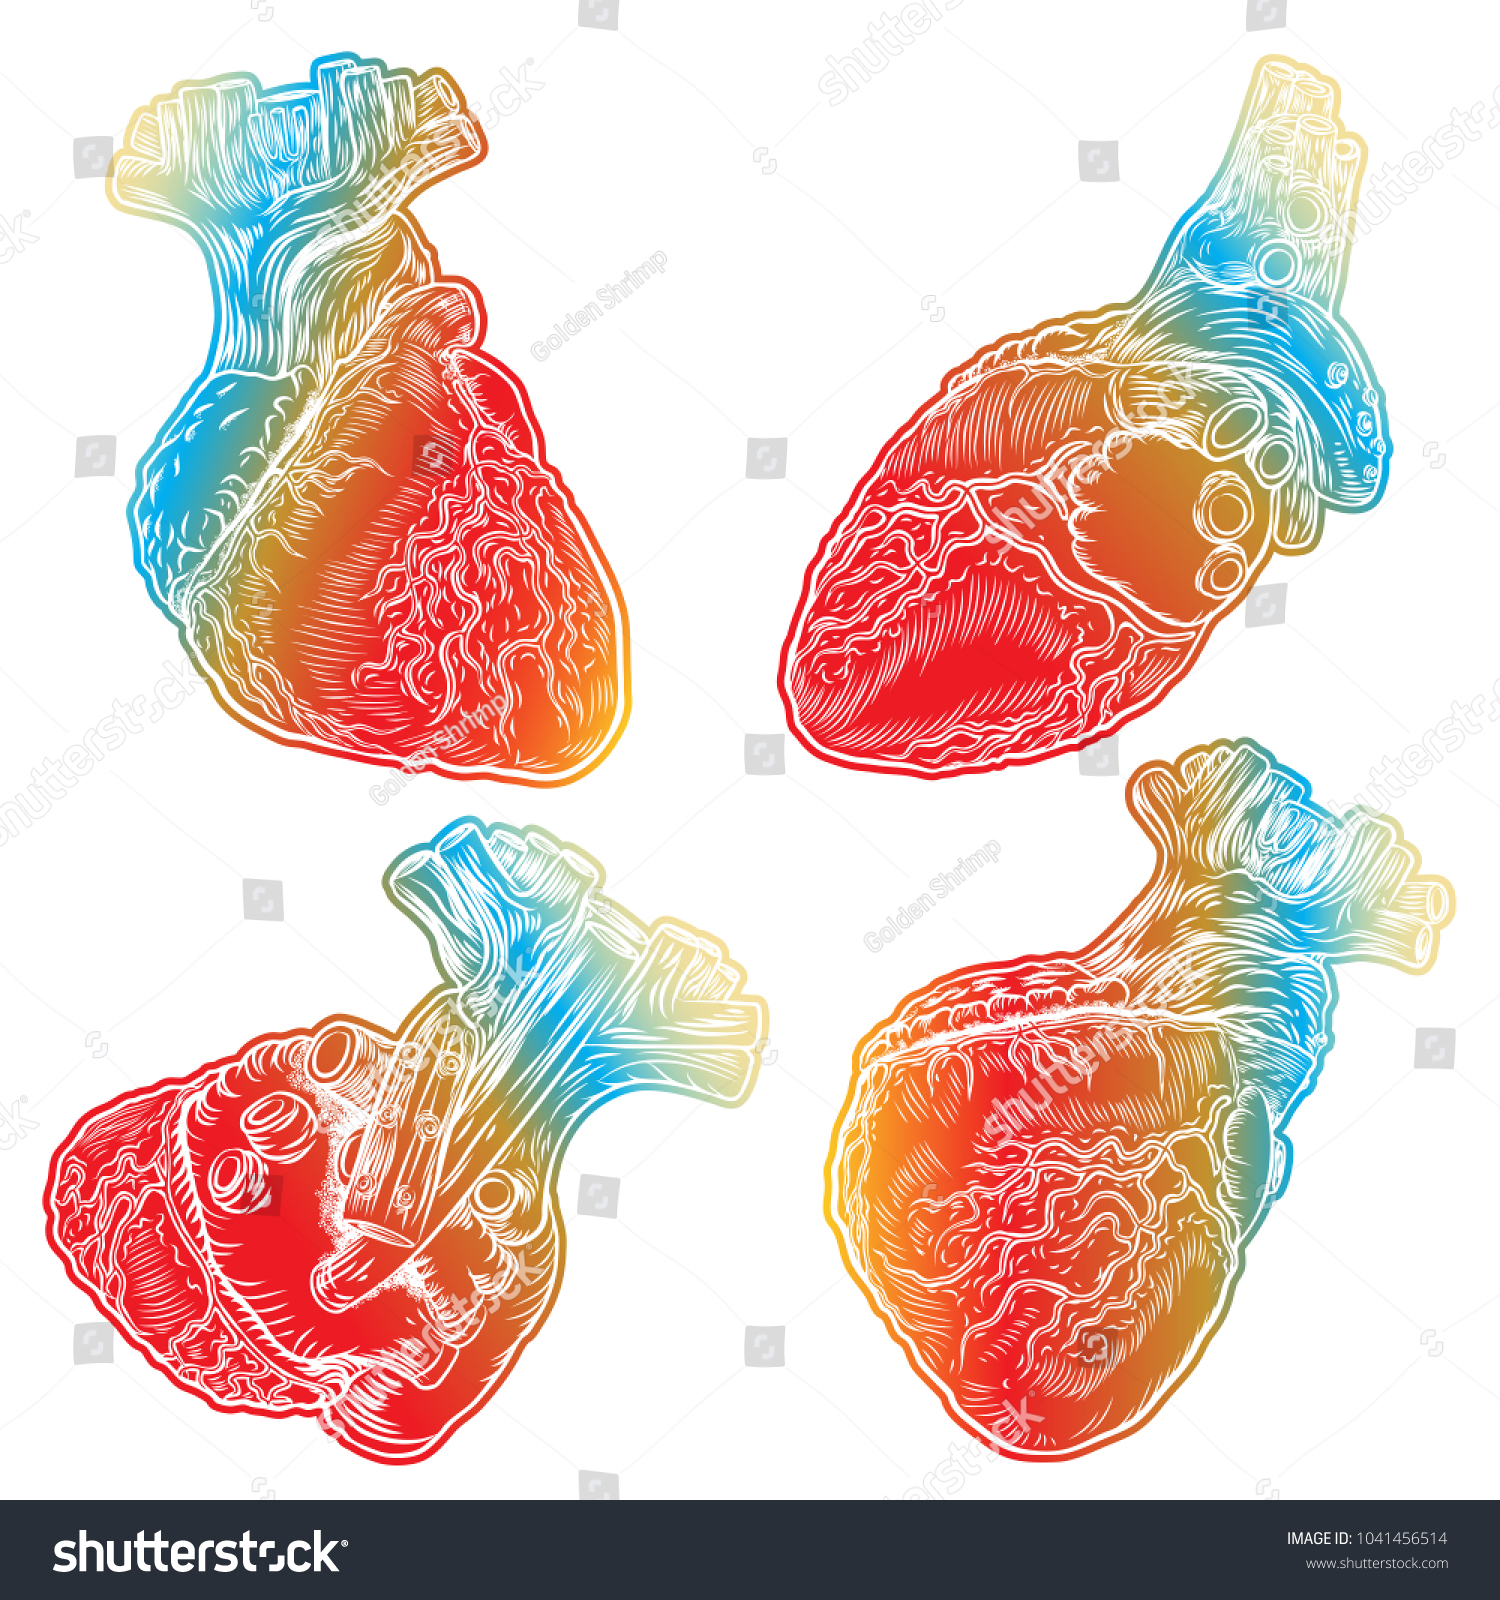 Set Red Human Hearts Aorta Veins Stock Illustration 1041456514 ...